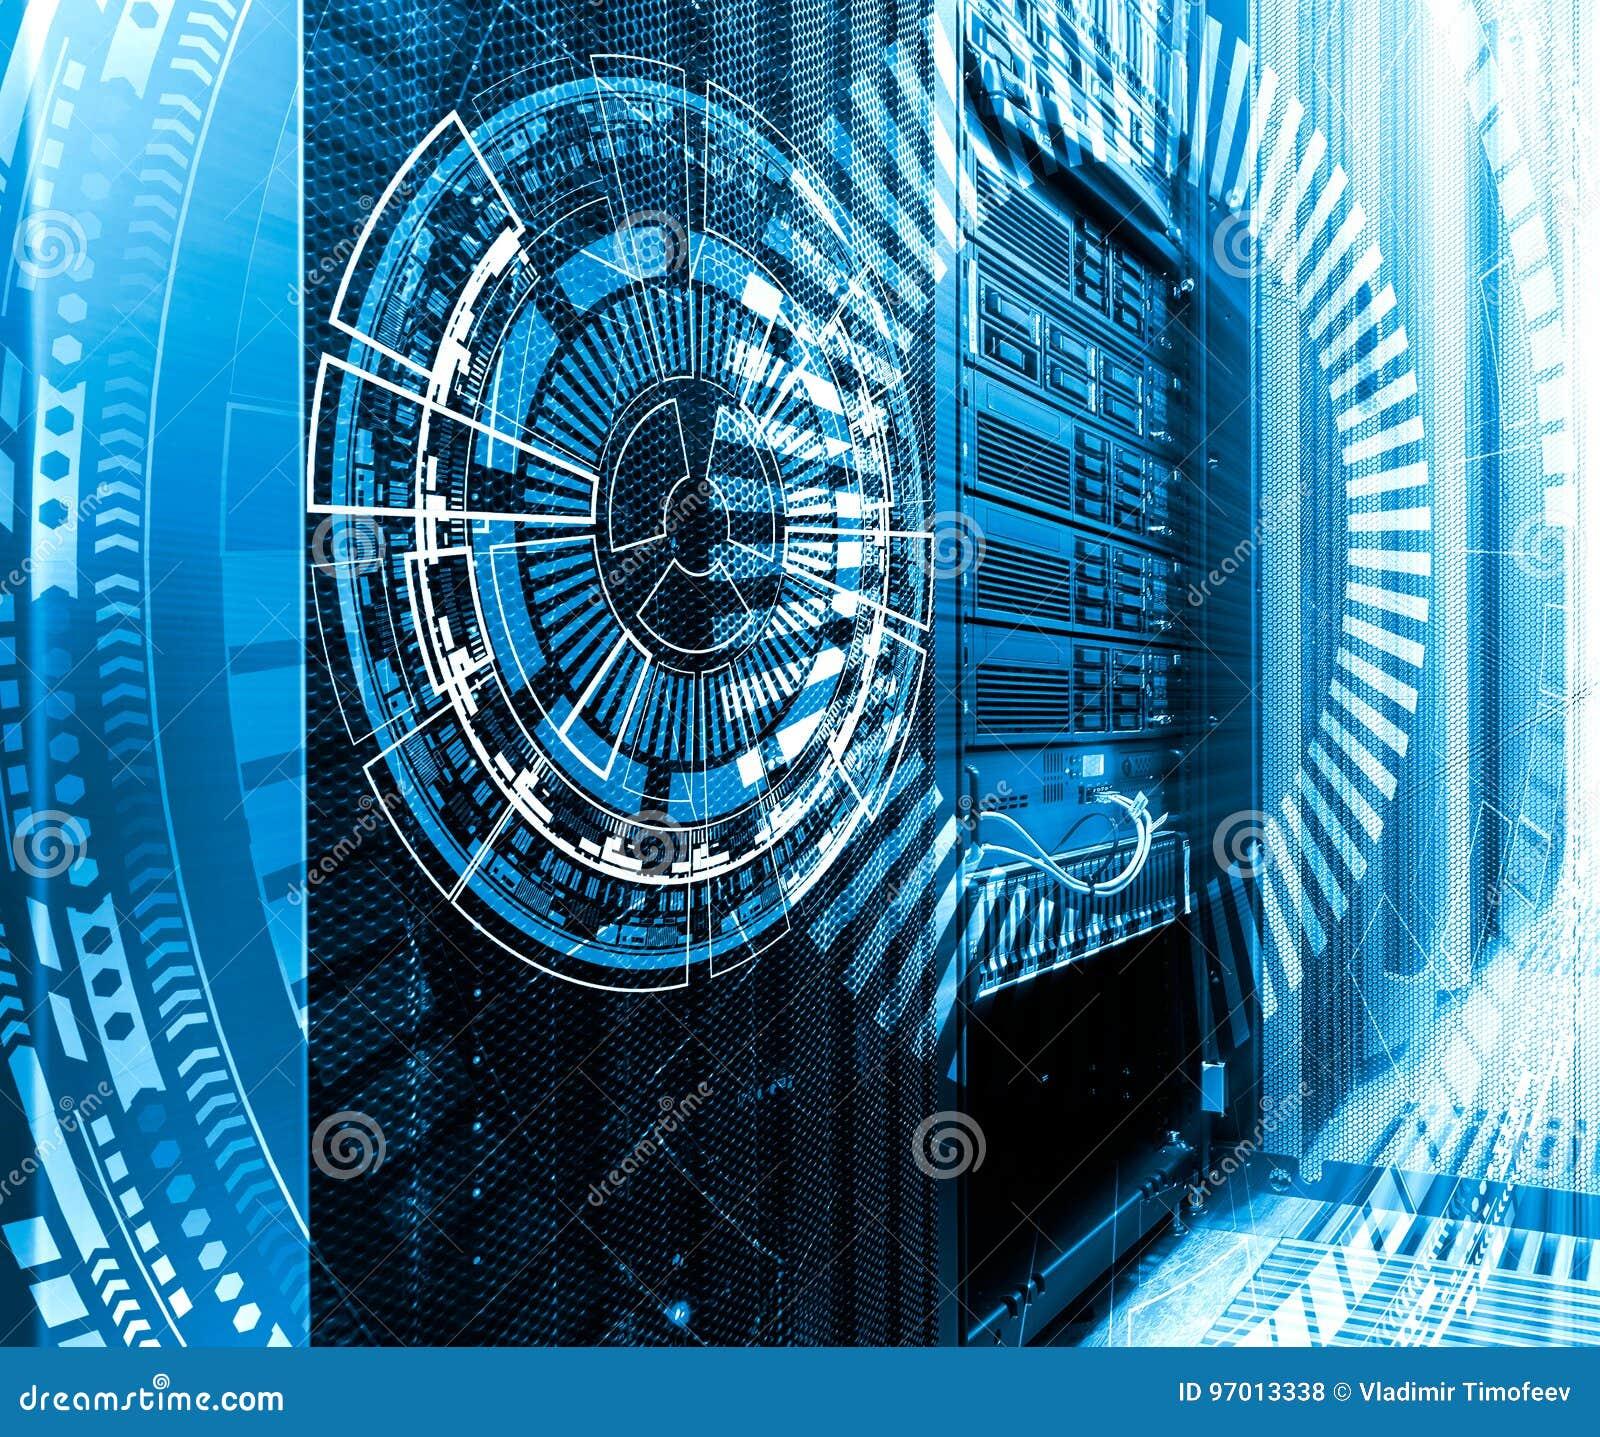 Tecnologia, Cyberspace e conceito da realidade virtual - holograma com fundo tecnologico